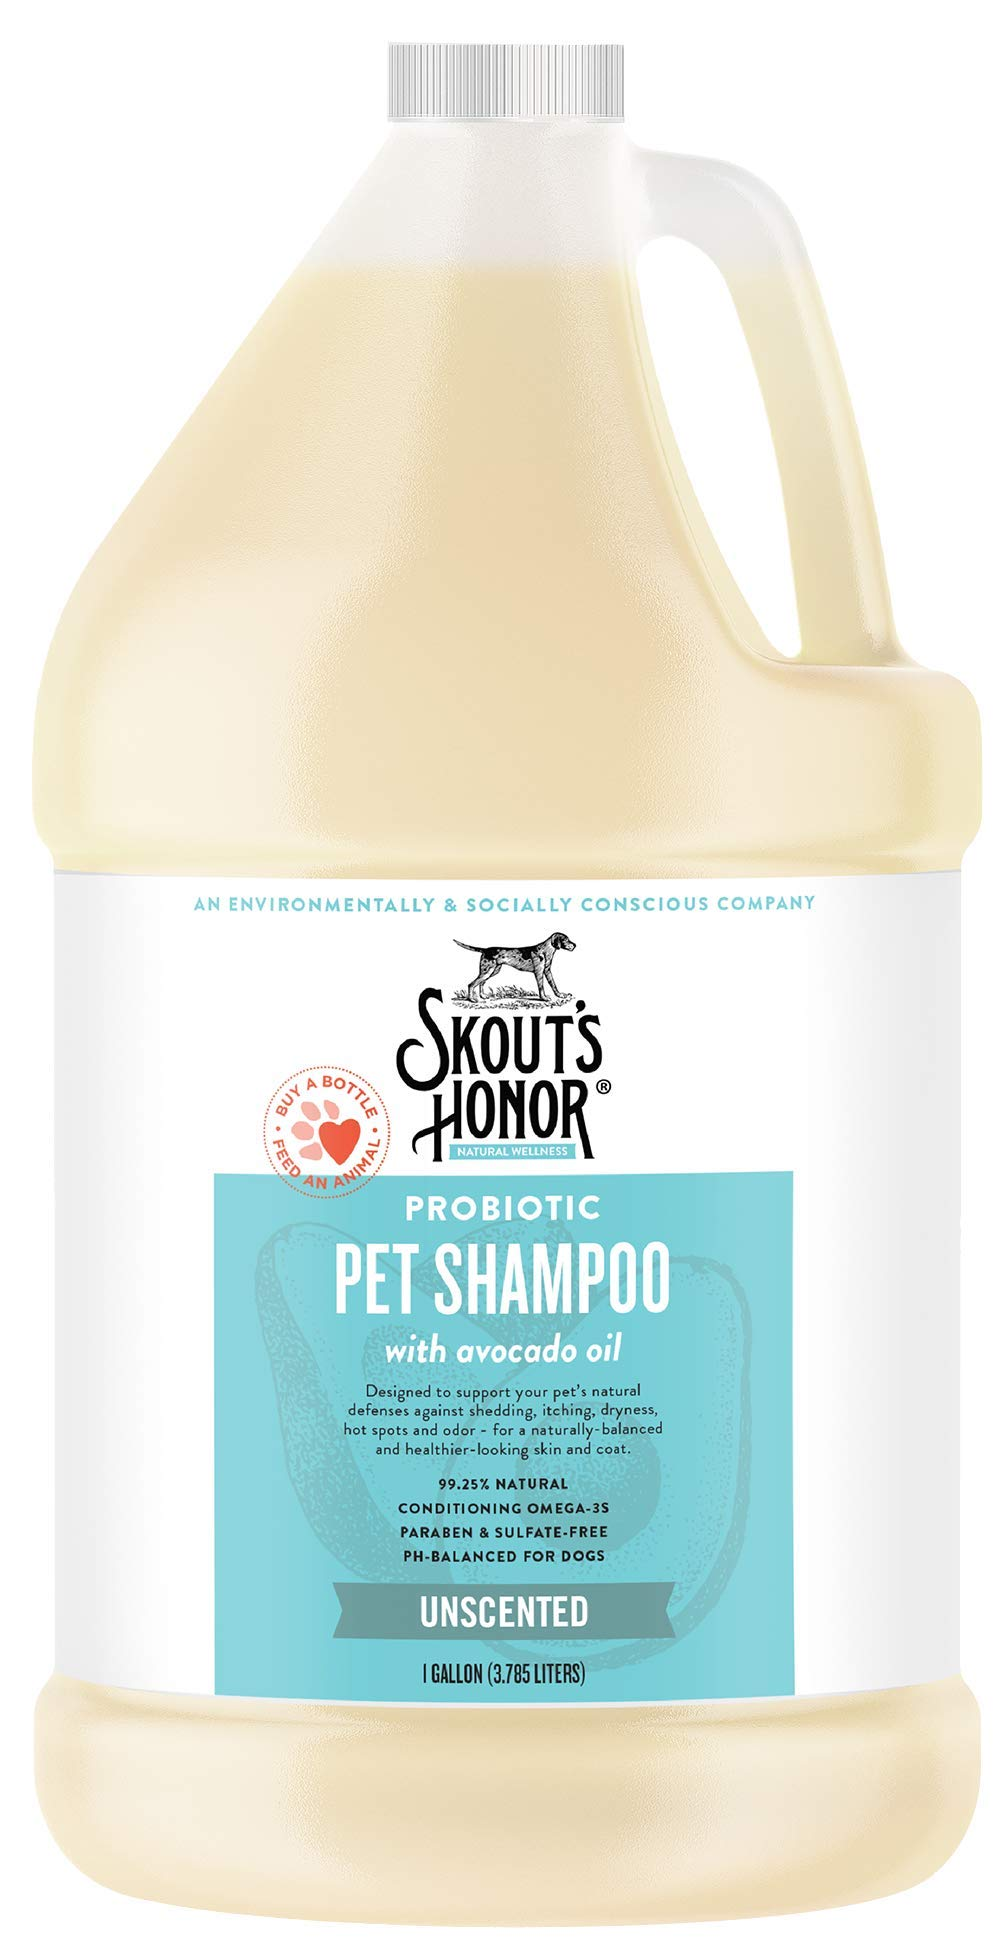 SKOUT'S HONOR Probiotic Shampoo Unscented